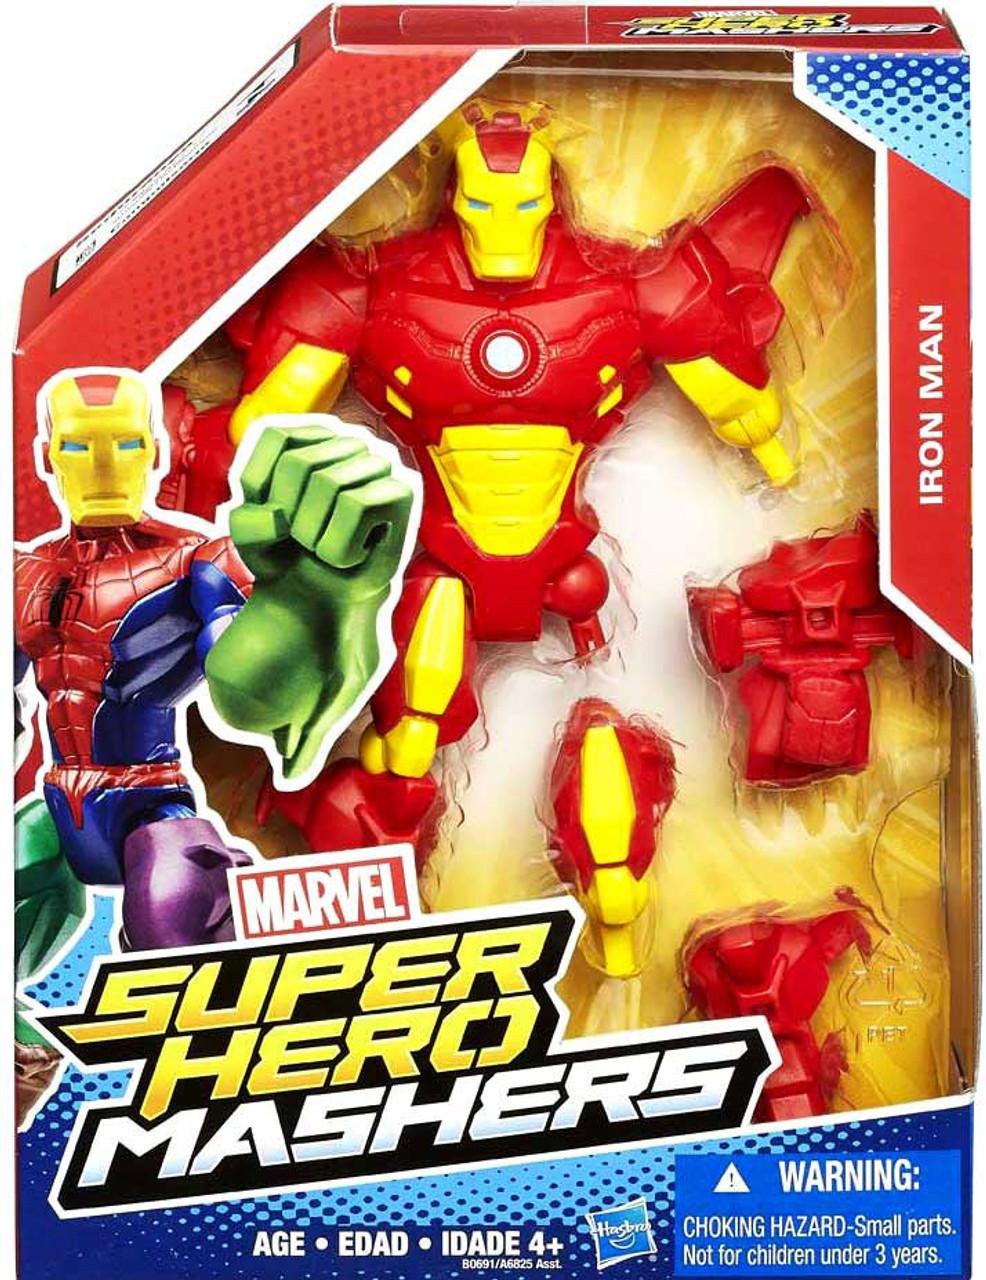 Marvel Super Hero Mashers Iron Man 6 Action Figure Red Armor Hasbro ... f76b24a67f